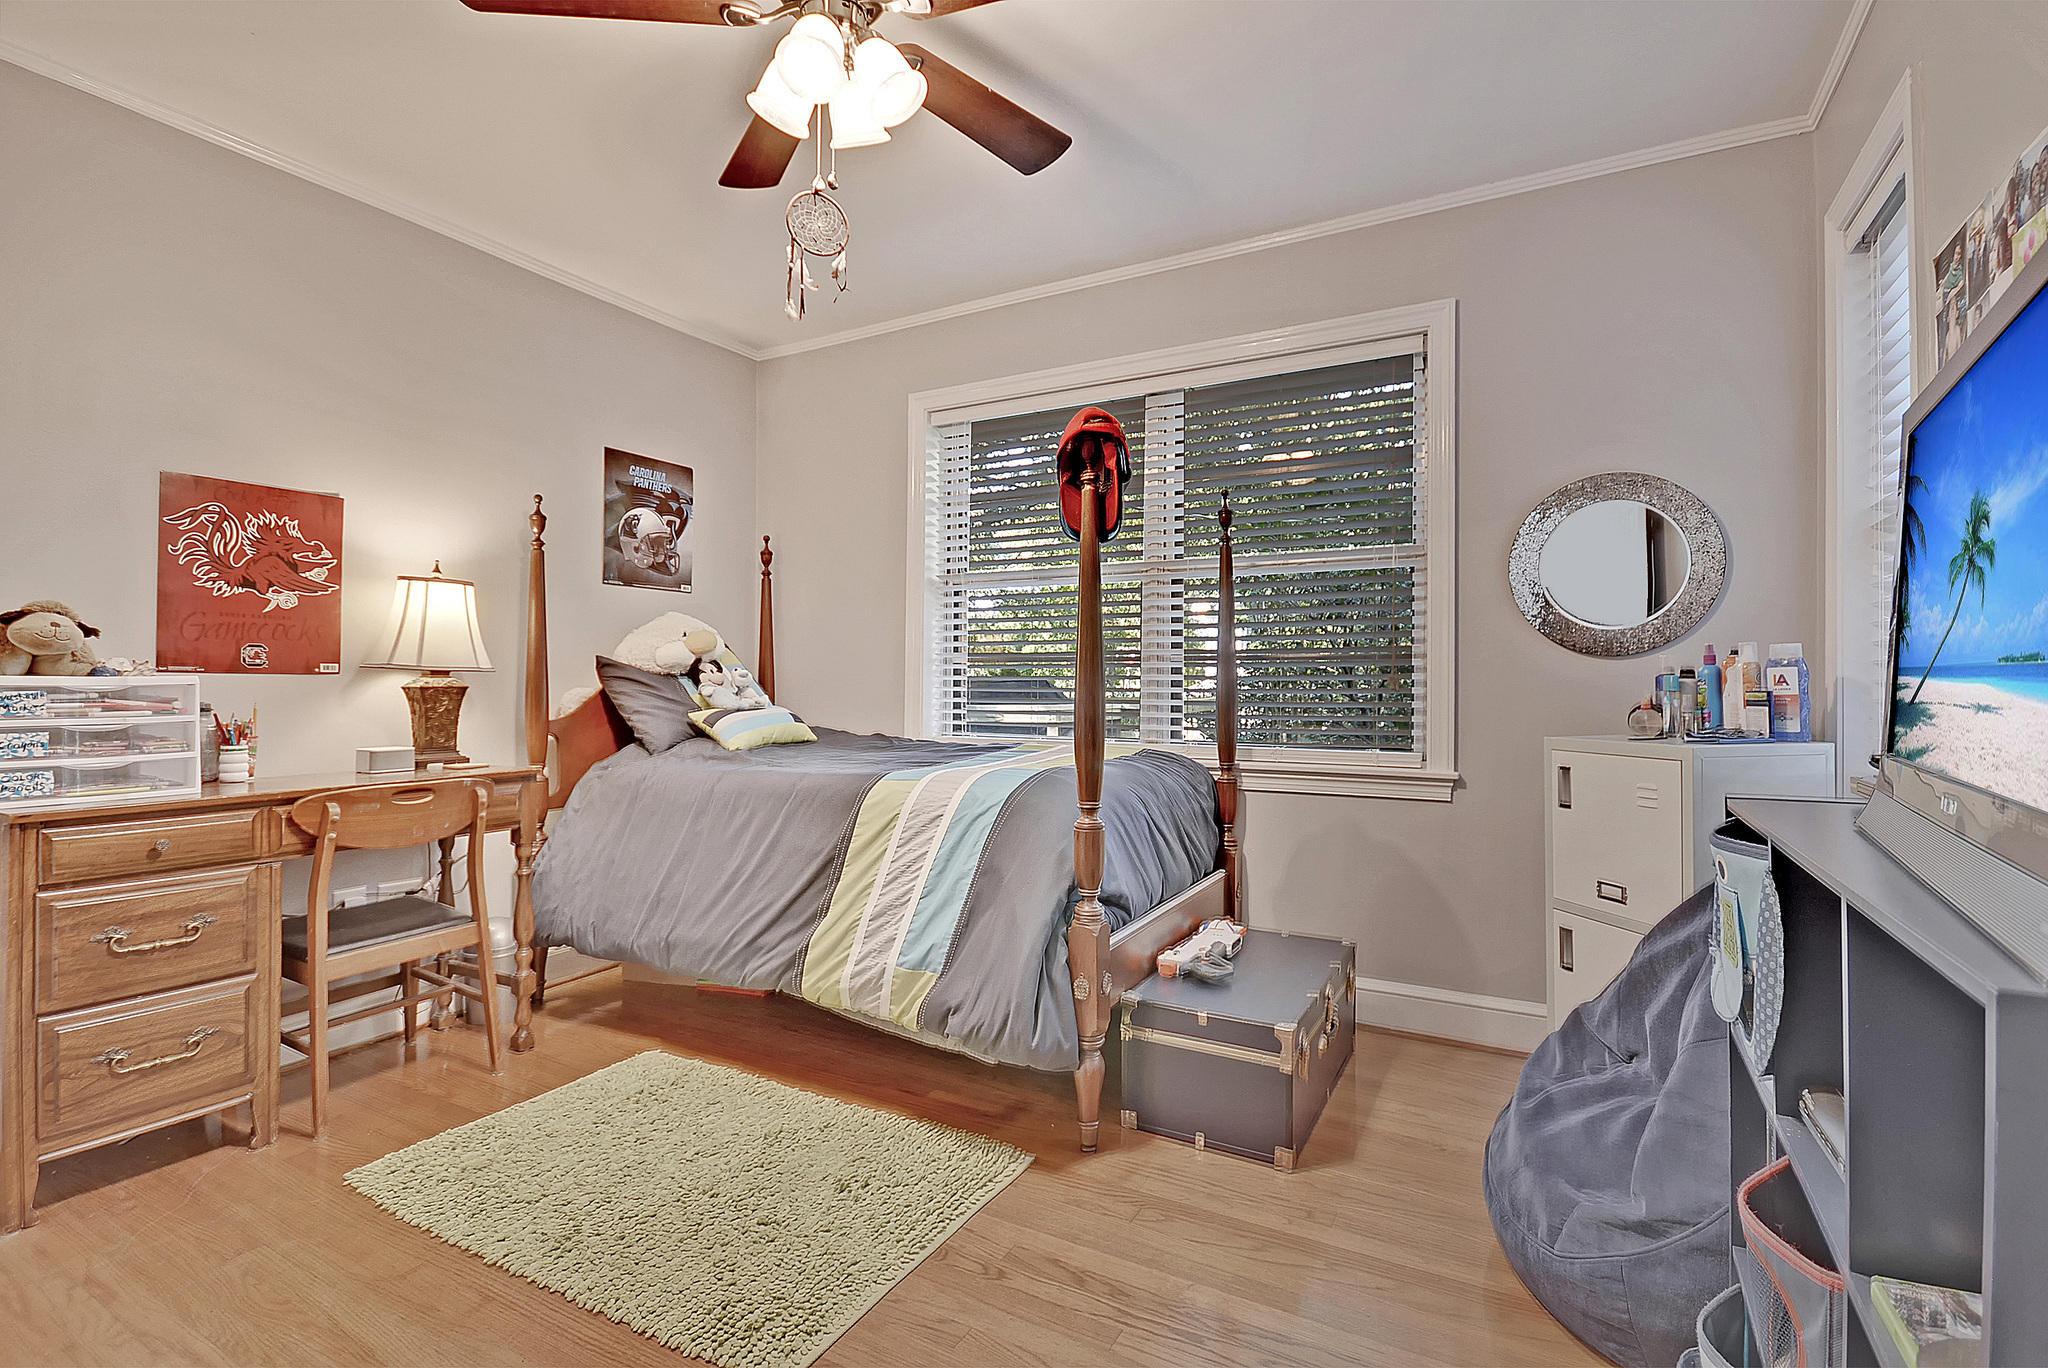 Edgewater Park Homes For Sale - 1356 Emory, Charleston, SC - 35